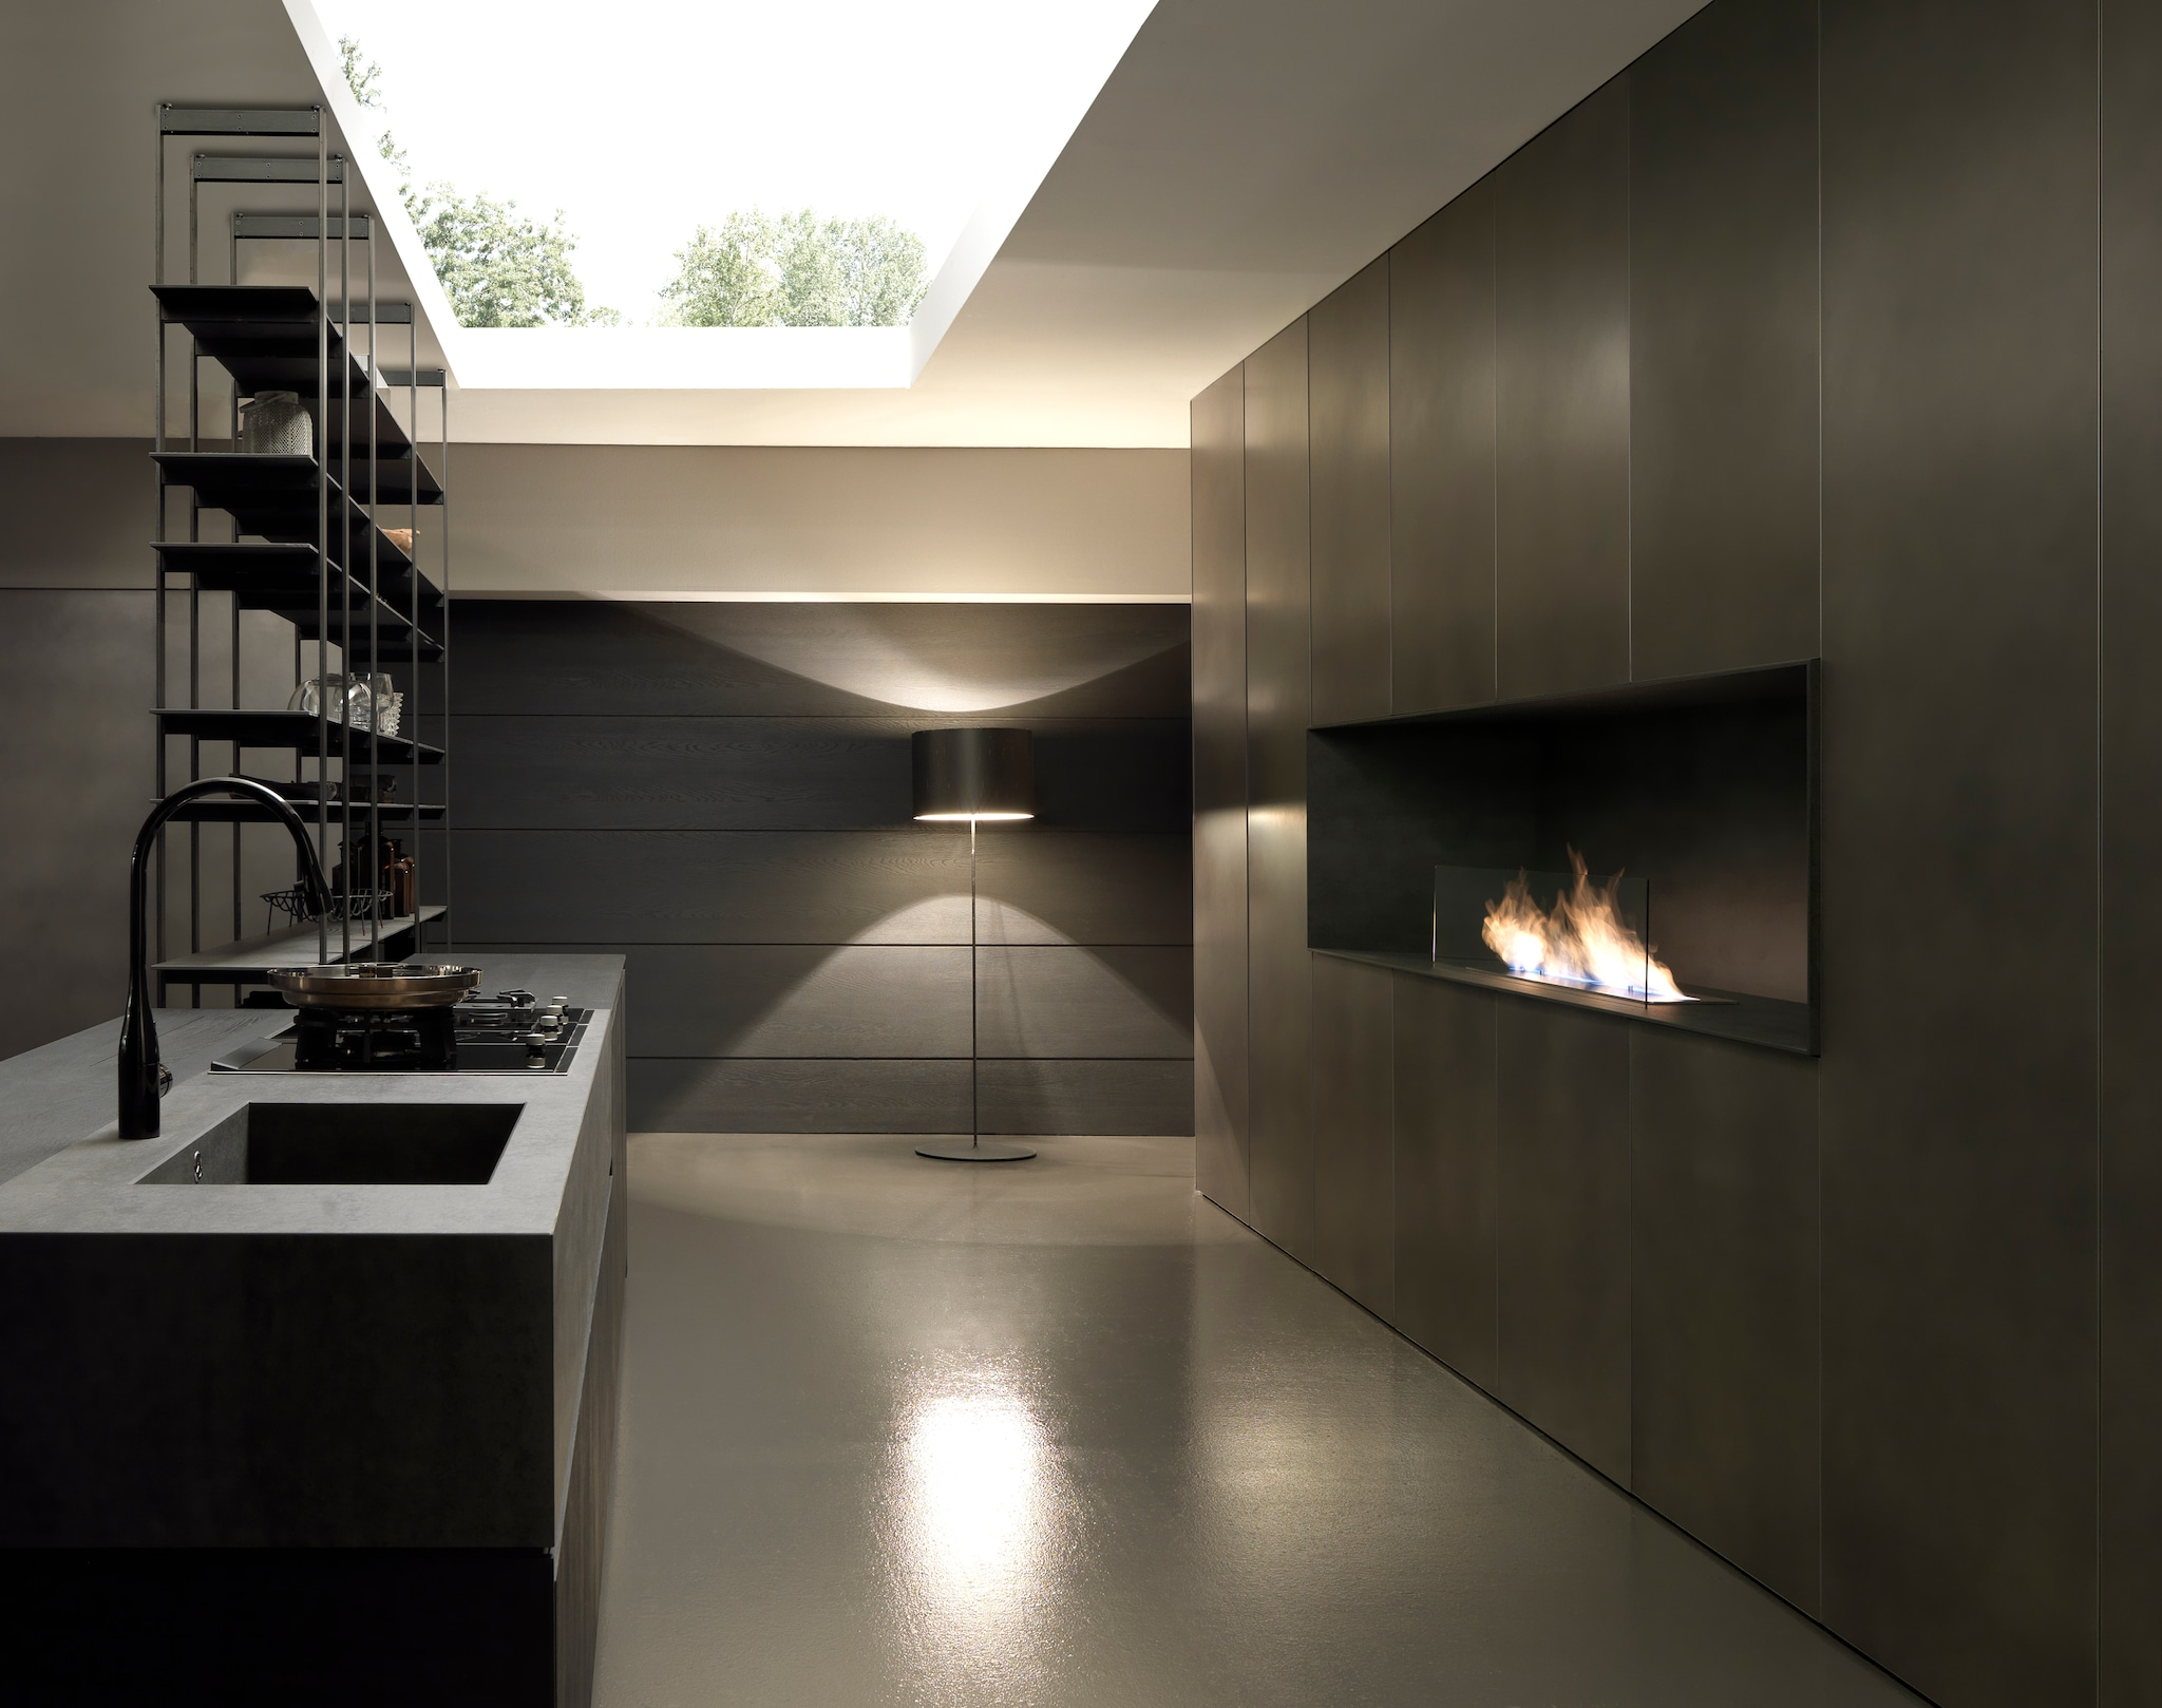 Excellent cucina moderna antracite sistema cucina completa - Colori muro cucina ...